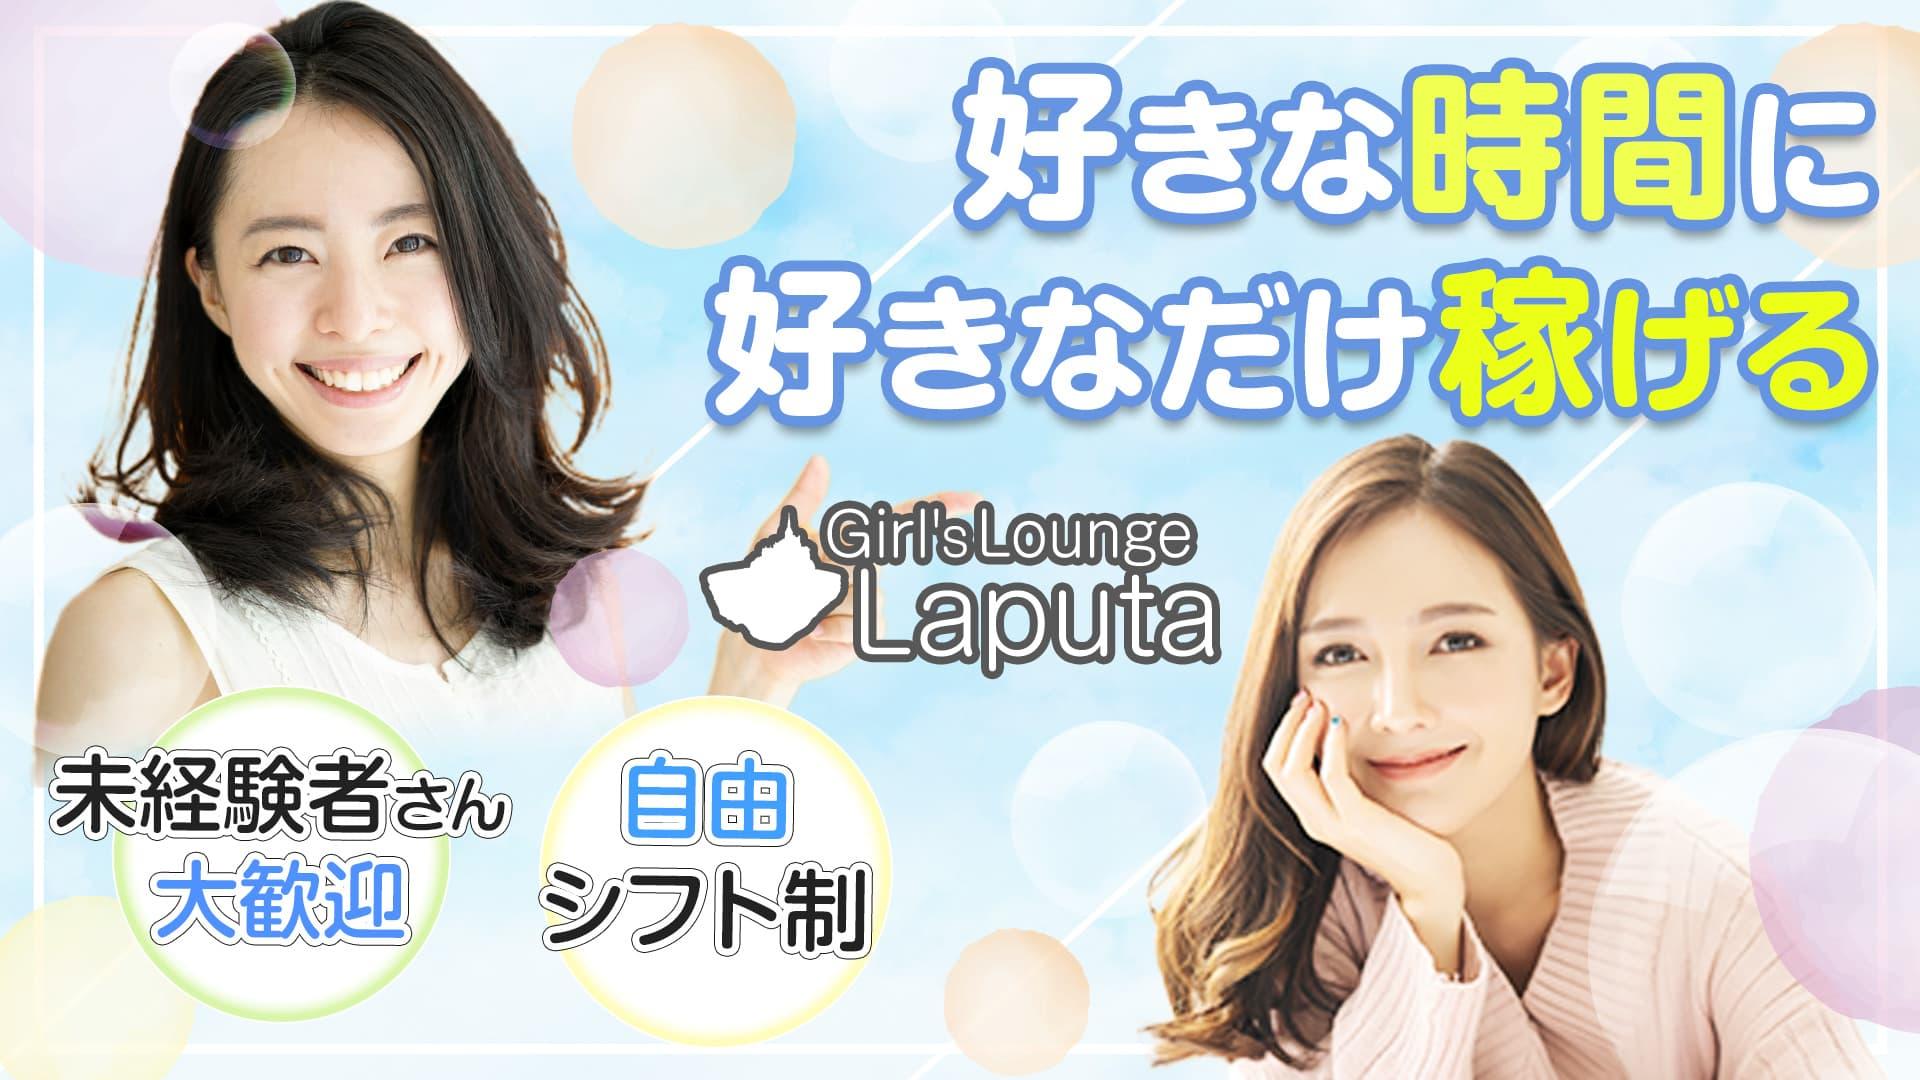 Girl's Lounge Laputa(ラピュタ)【公式求人・体入情報】 大宮ガールズラウンジ TOP画像